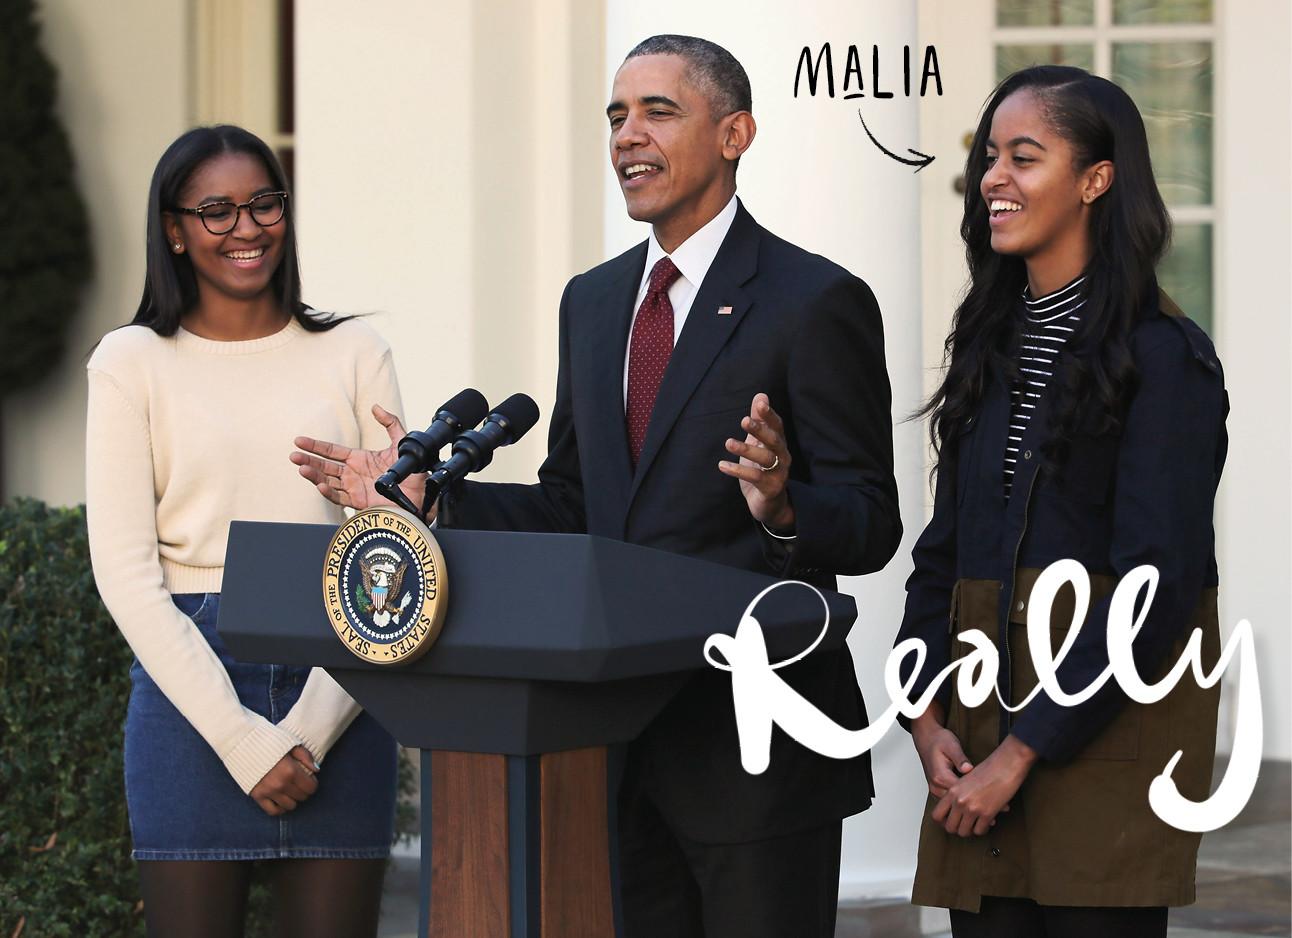 malia obama lachend met haar vader Barack obama op het podium